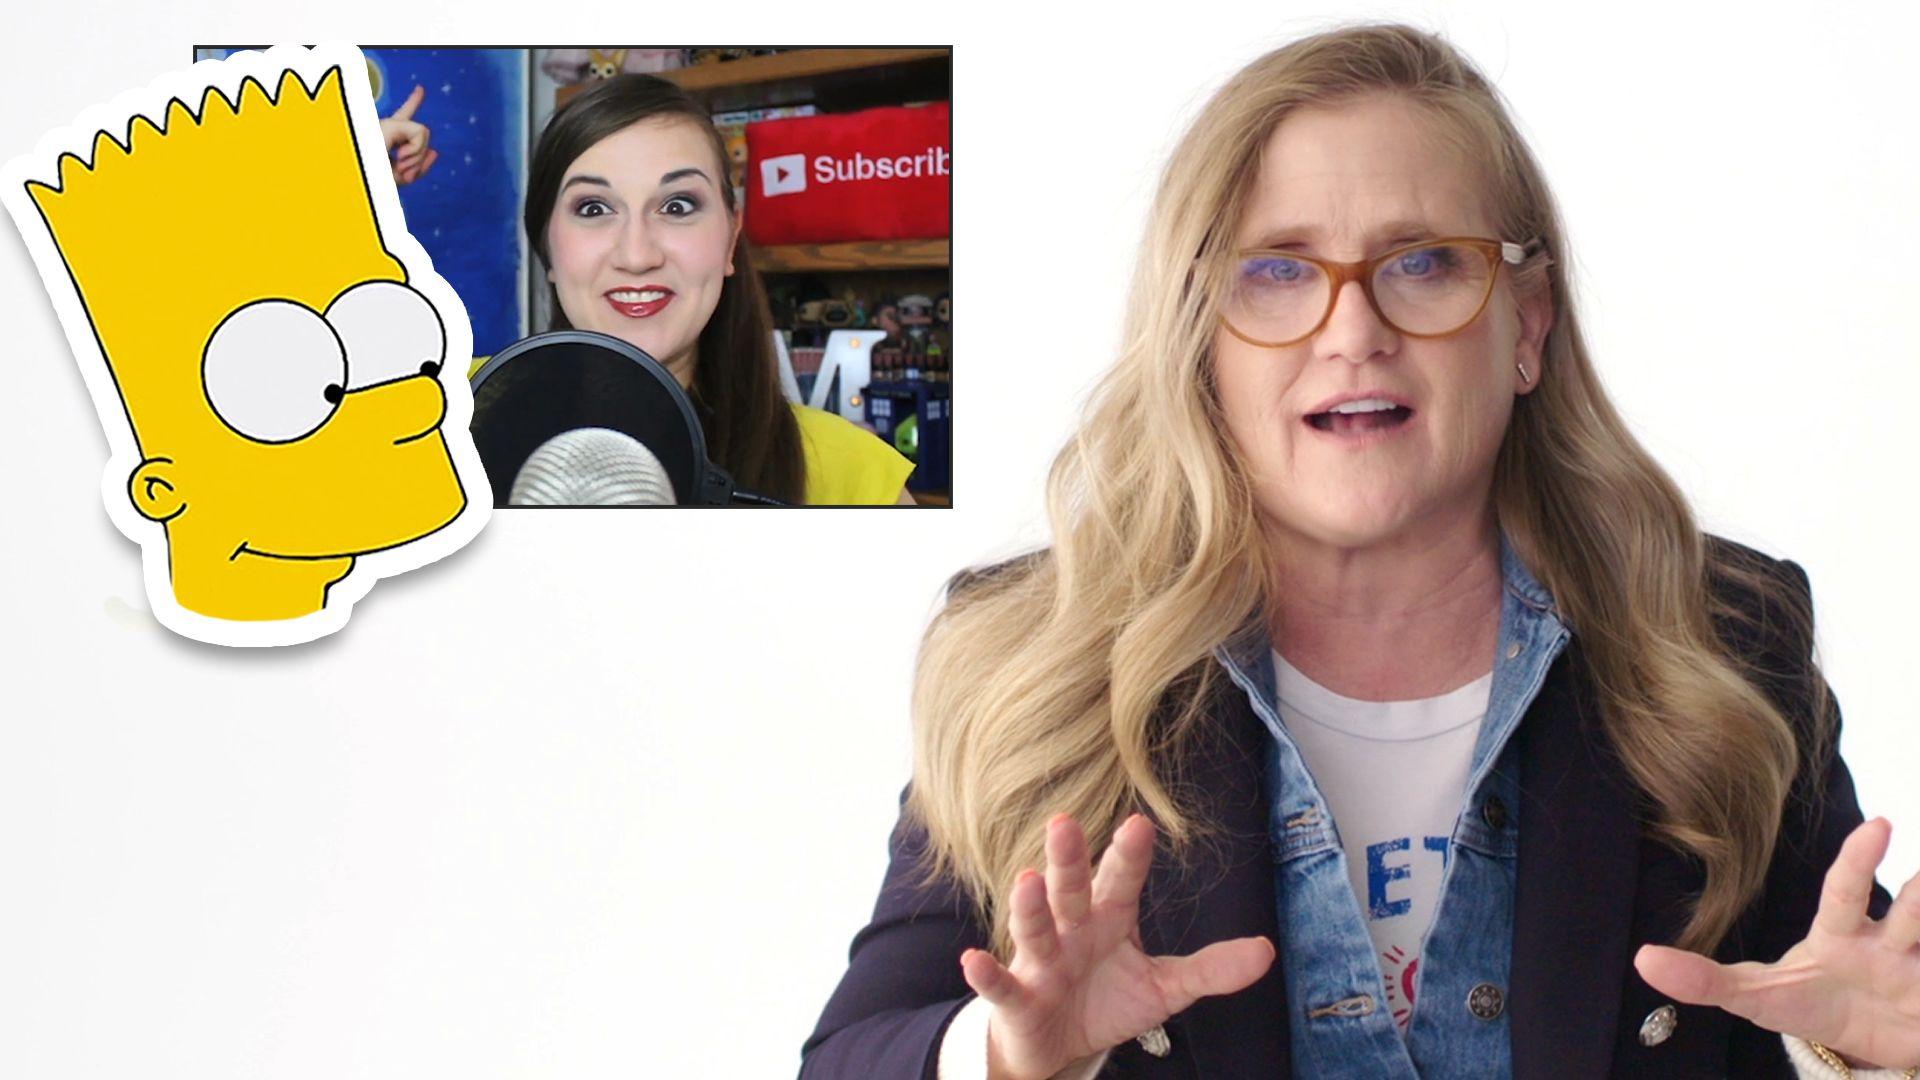 Watch Reviews Nancy Cartwright Bart Simpson Reviews Impressions Of Her Voices Vanity Fair Video Cne Vanityfair Com Vanity Fair